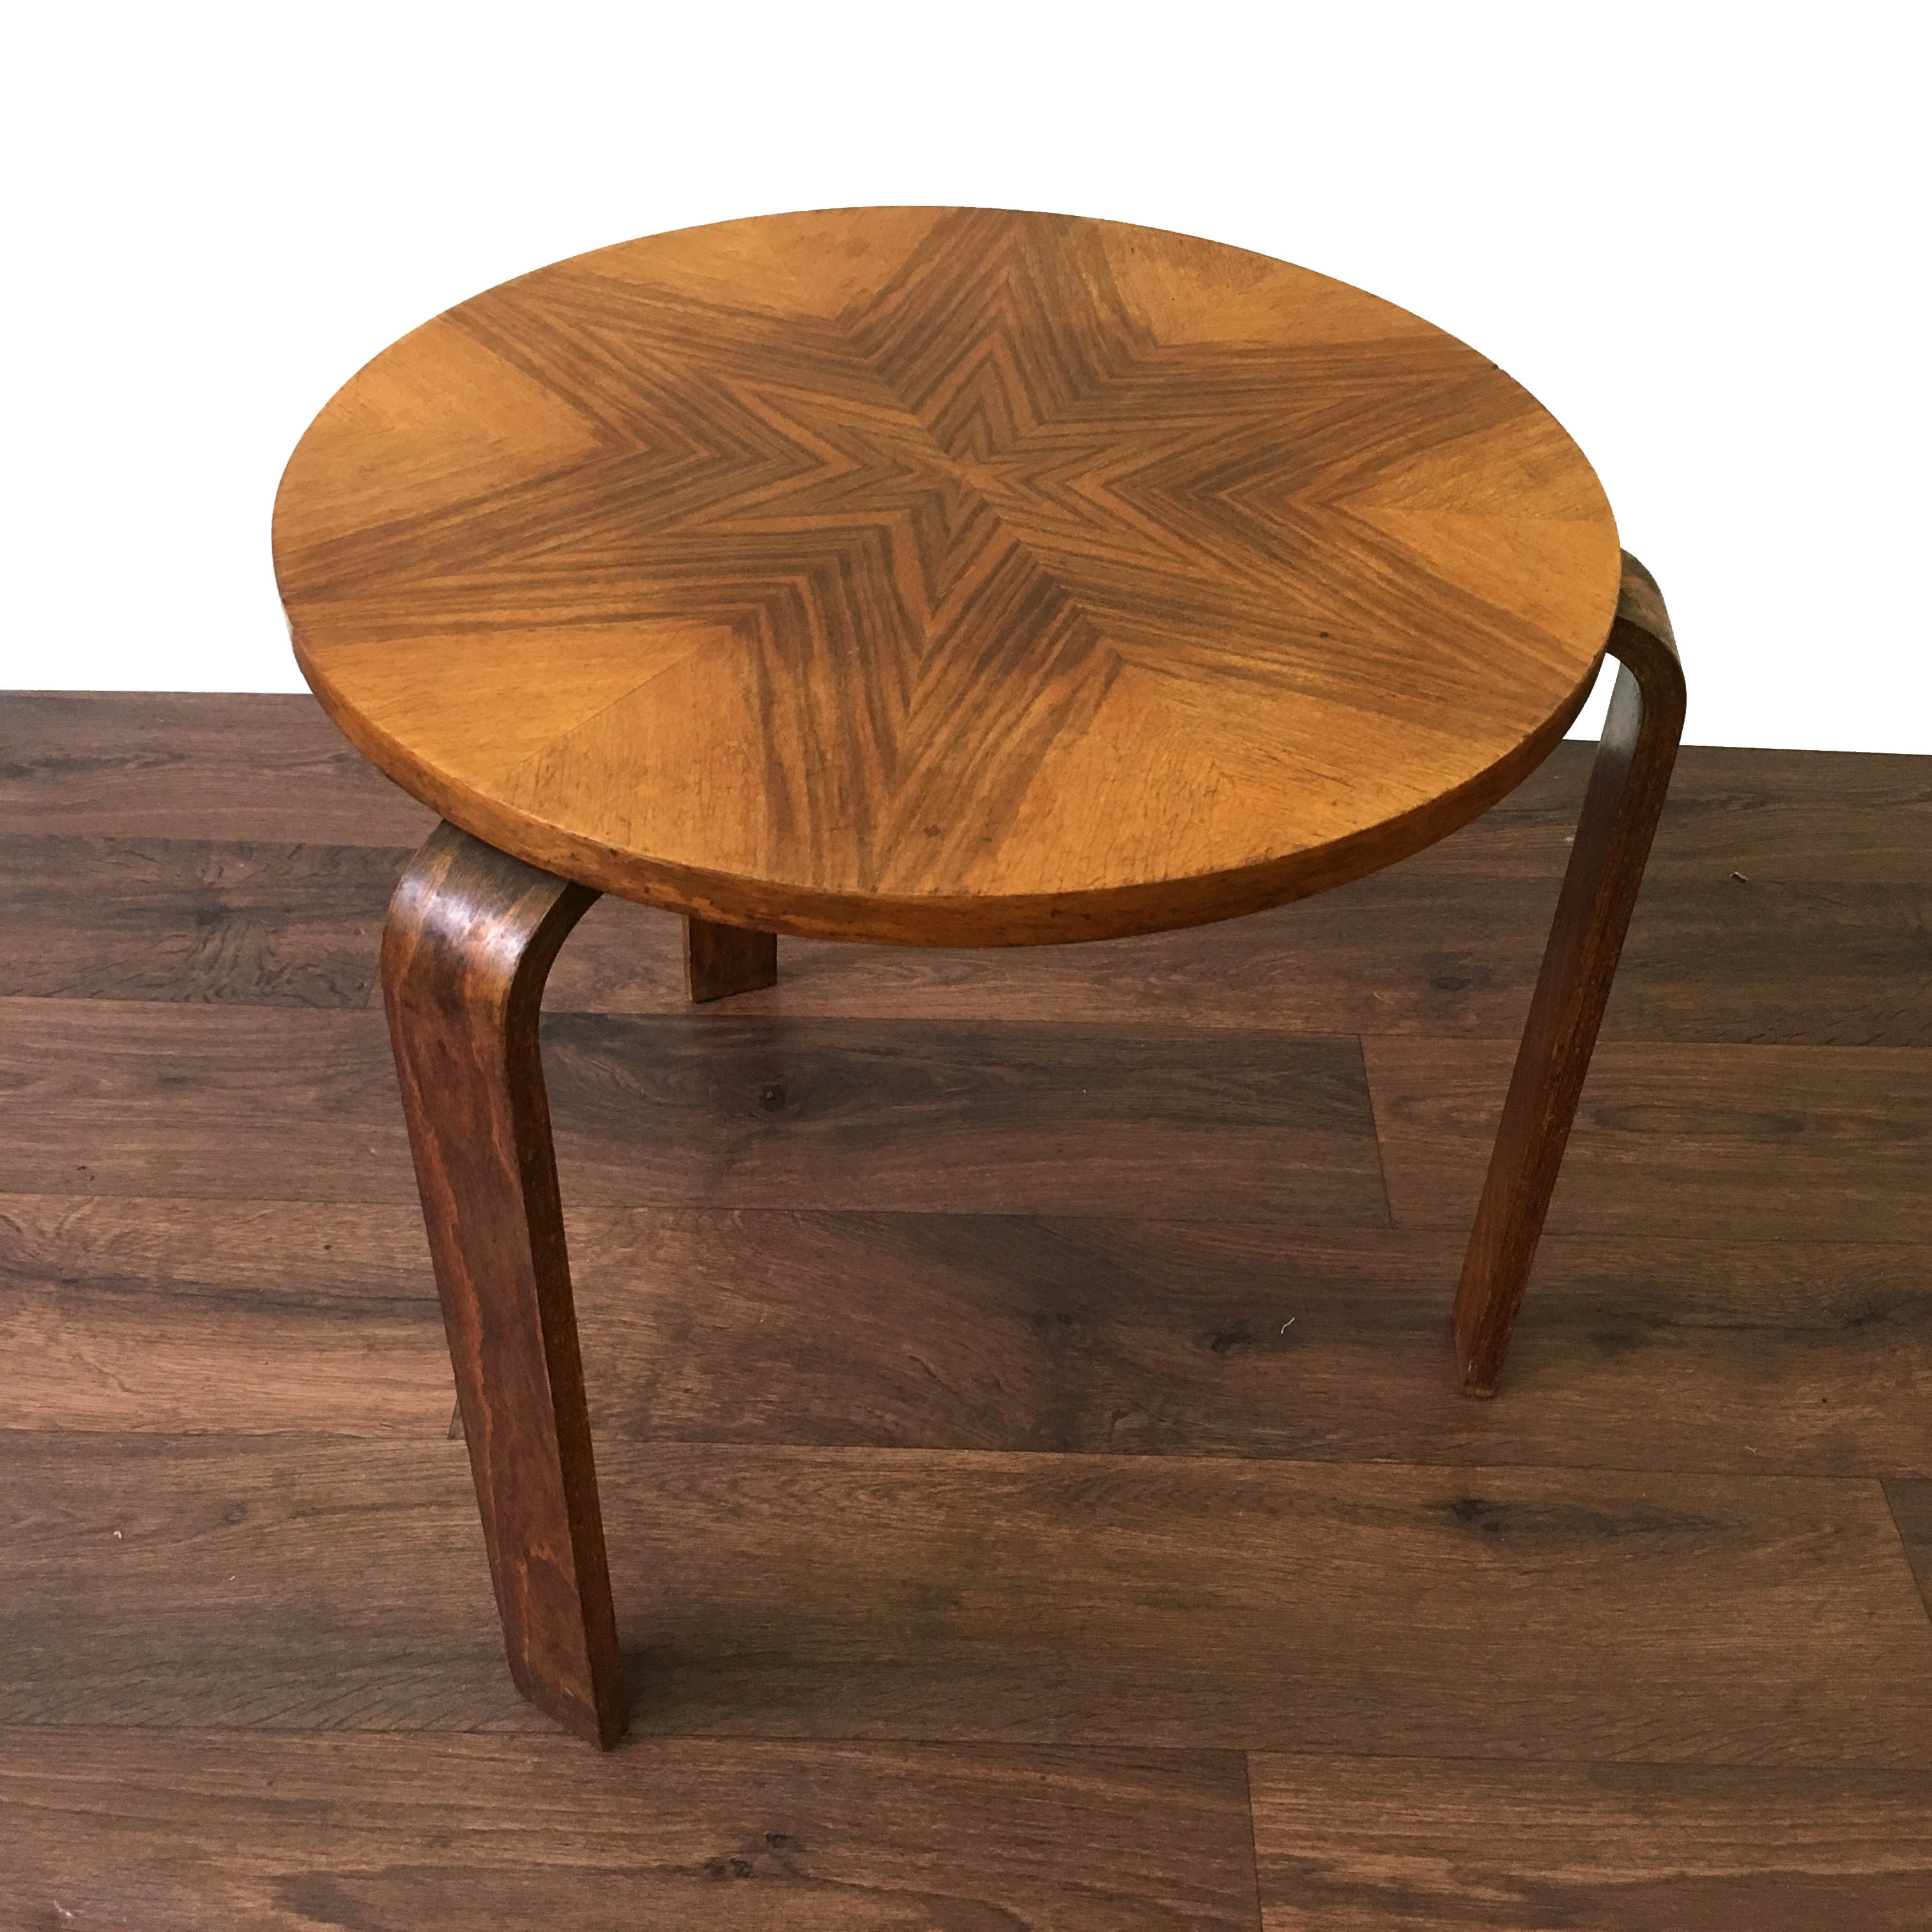 Aalvar Aalto Style Table